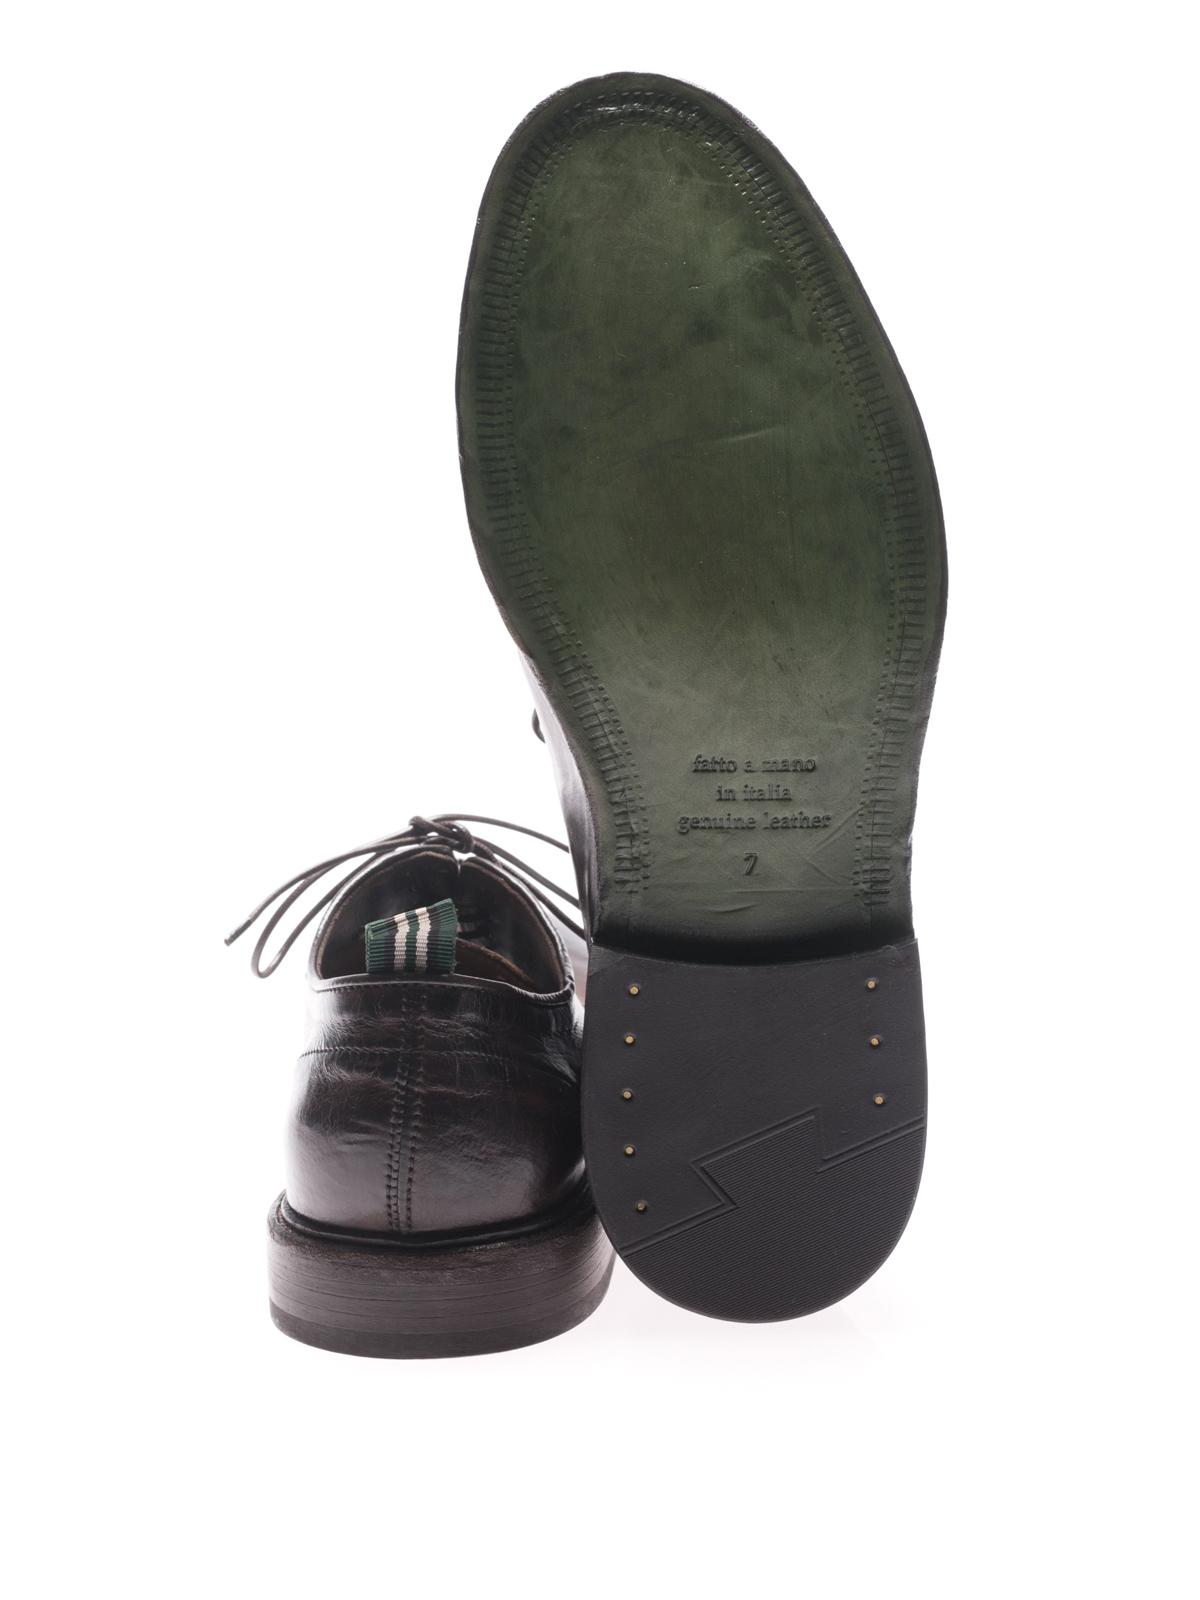 quality design 38caf 9f77f Green George - Stringate marroni vintage Maremma - scarpe ...